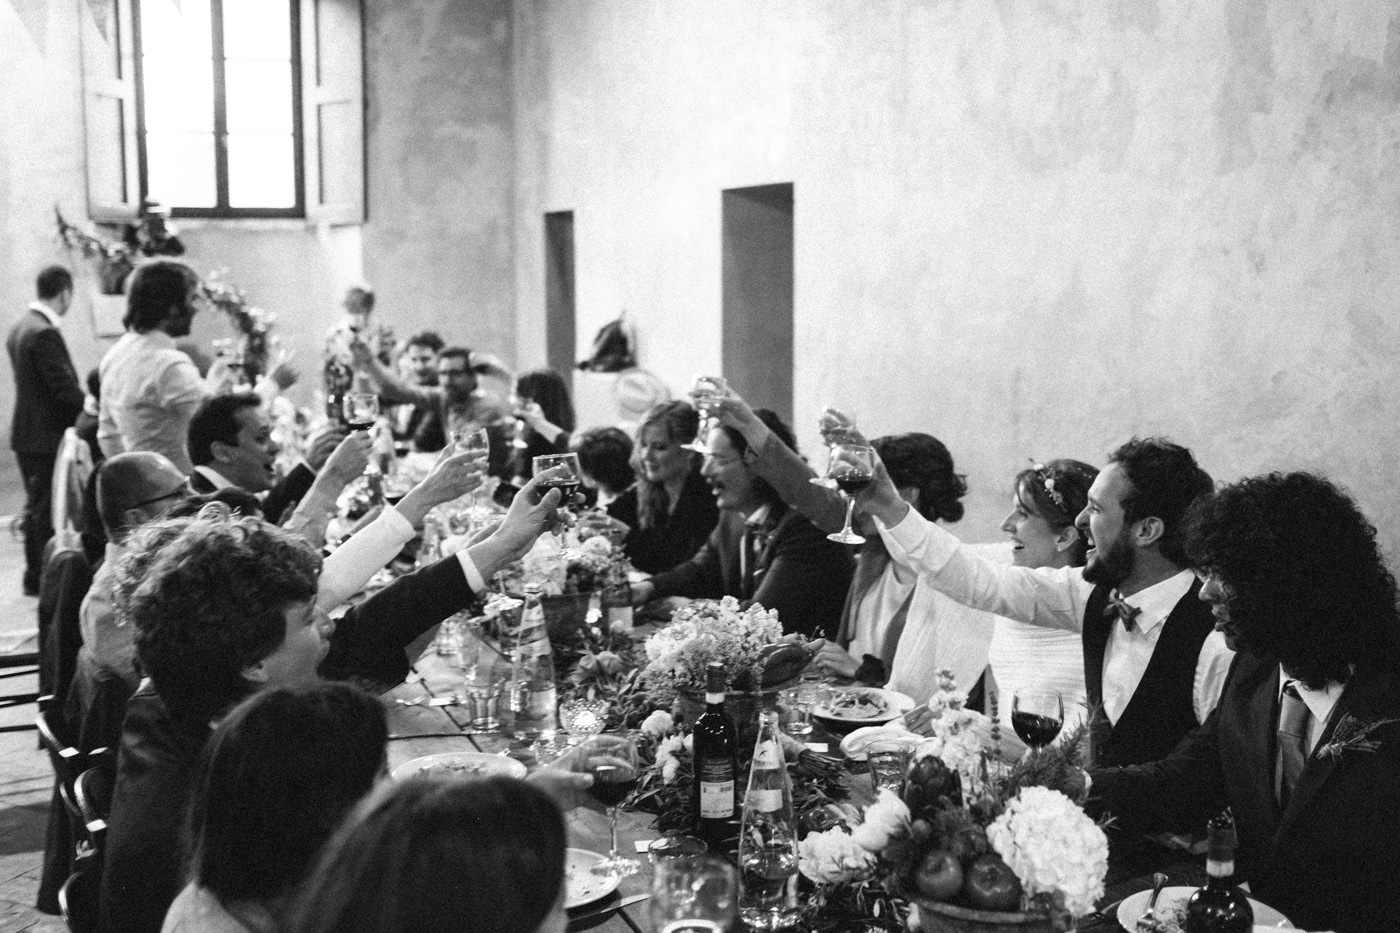 matrimoni_all_italiana_fotografo_matrimonio_toscana-69.jpg